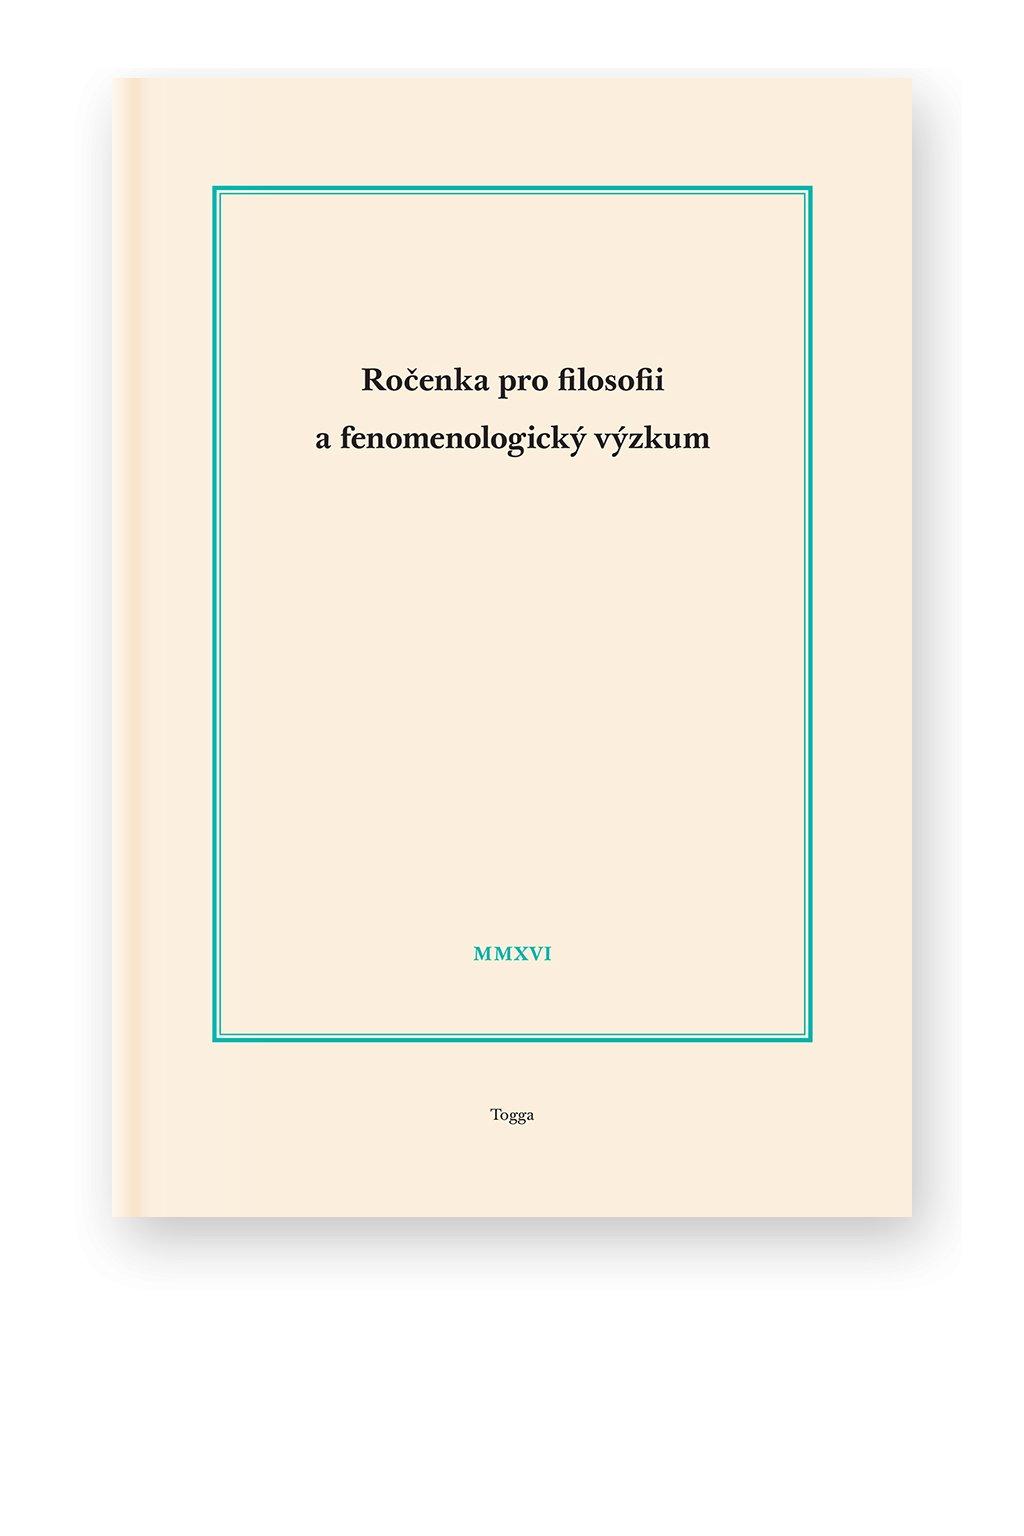 1155 rocenka pro filosofii a fenomenologicky vyzkum 2016